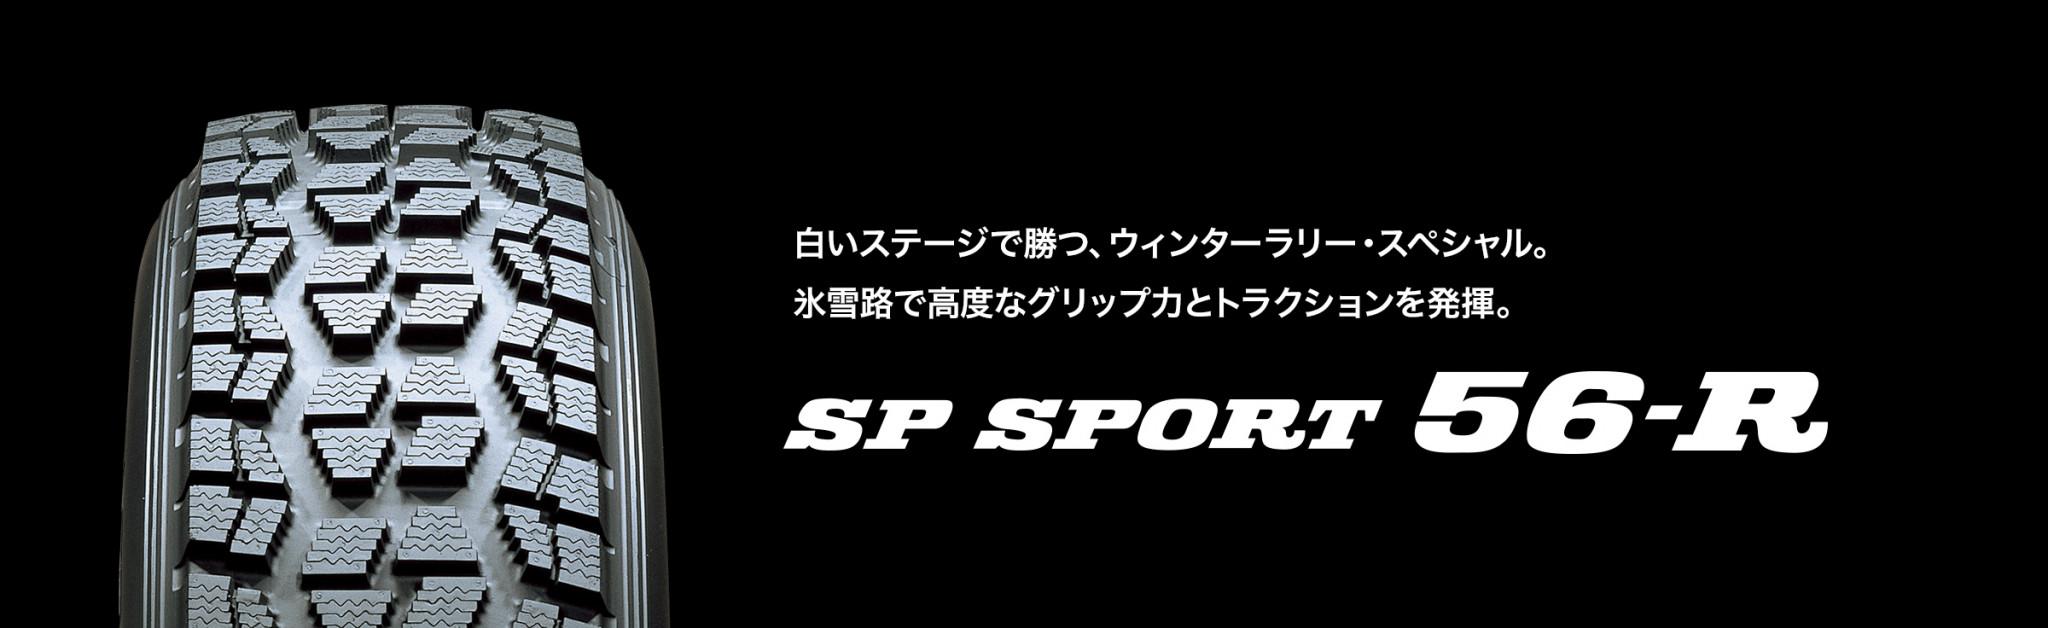 SP SPORT 56-R